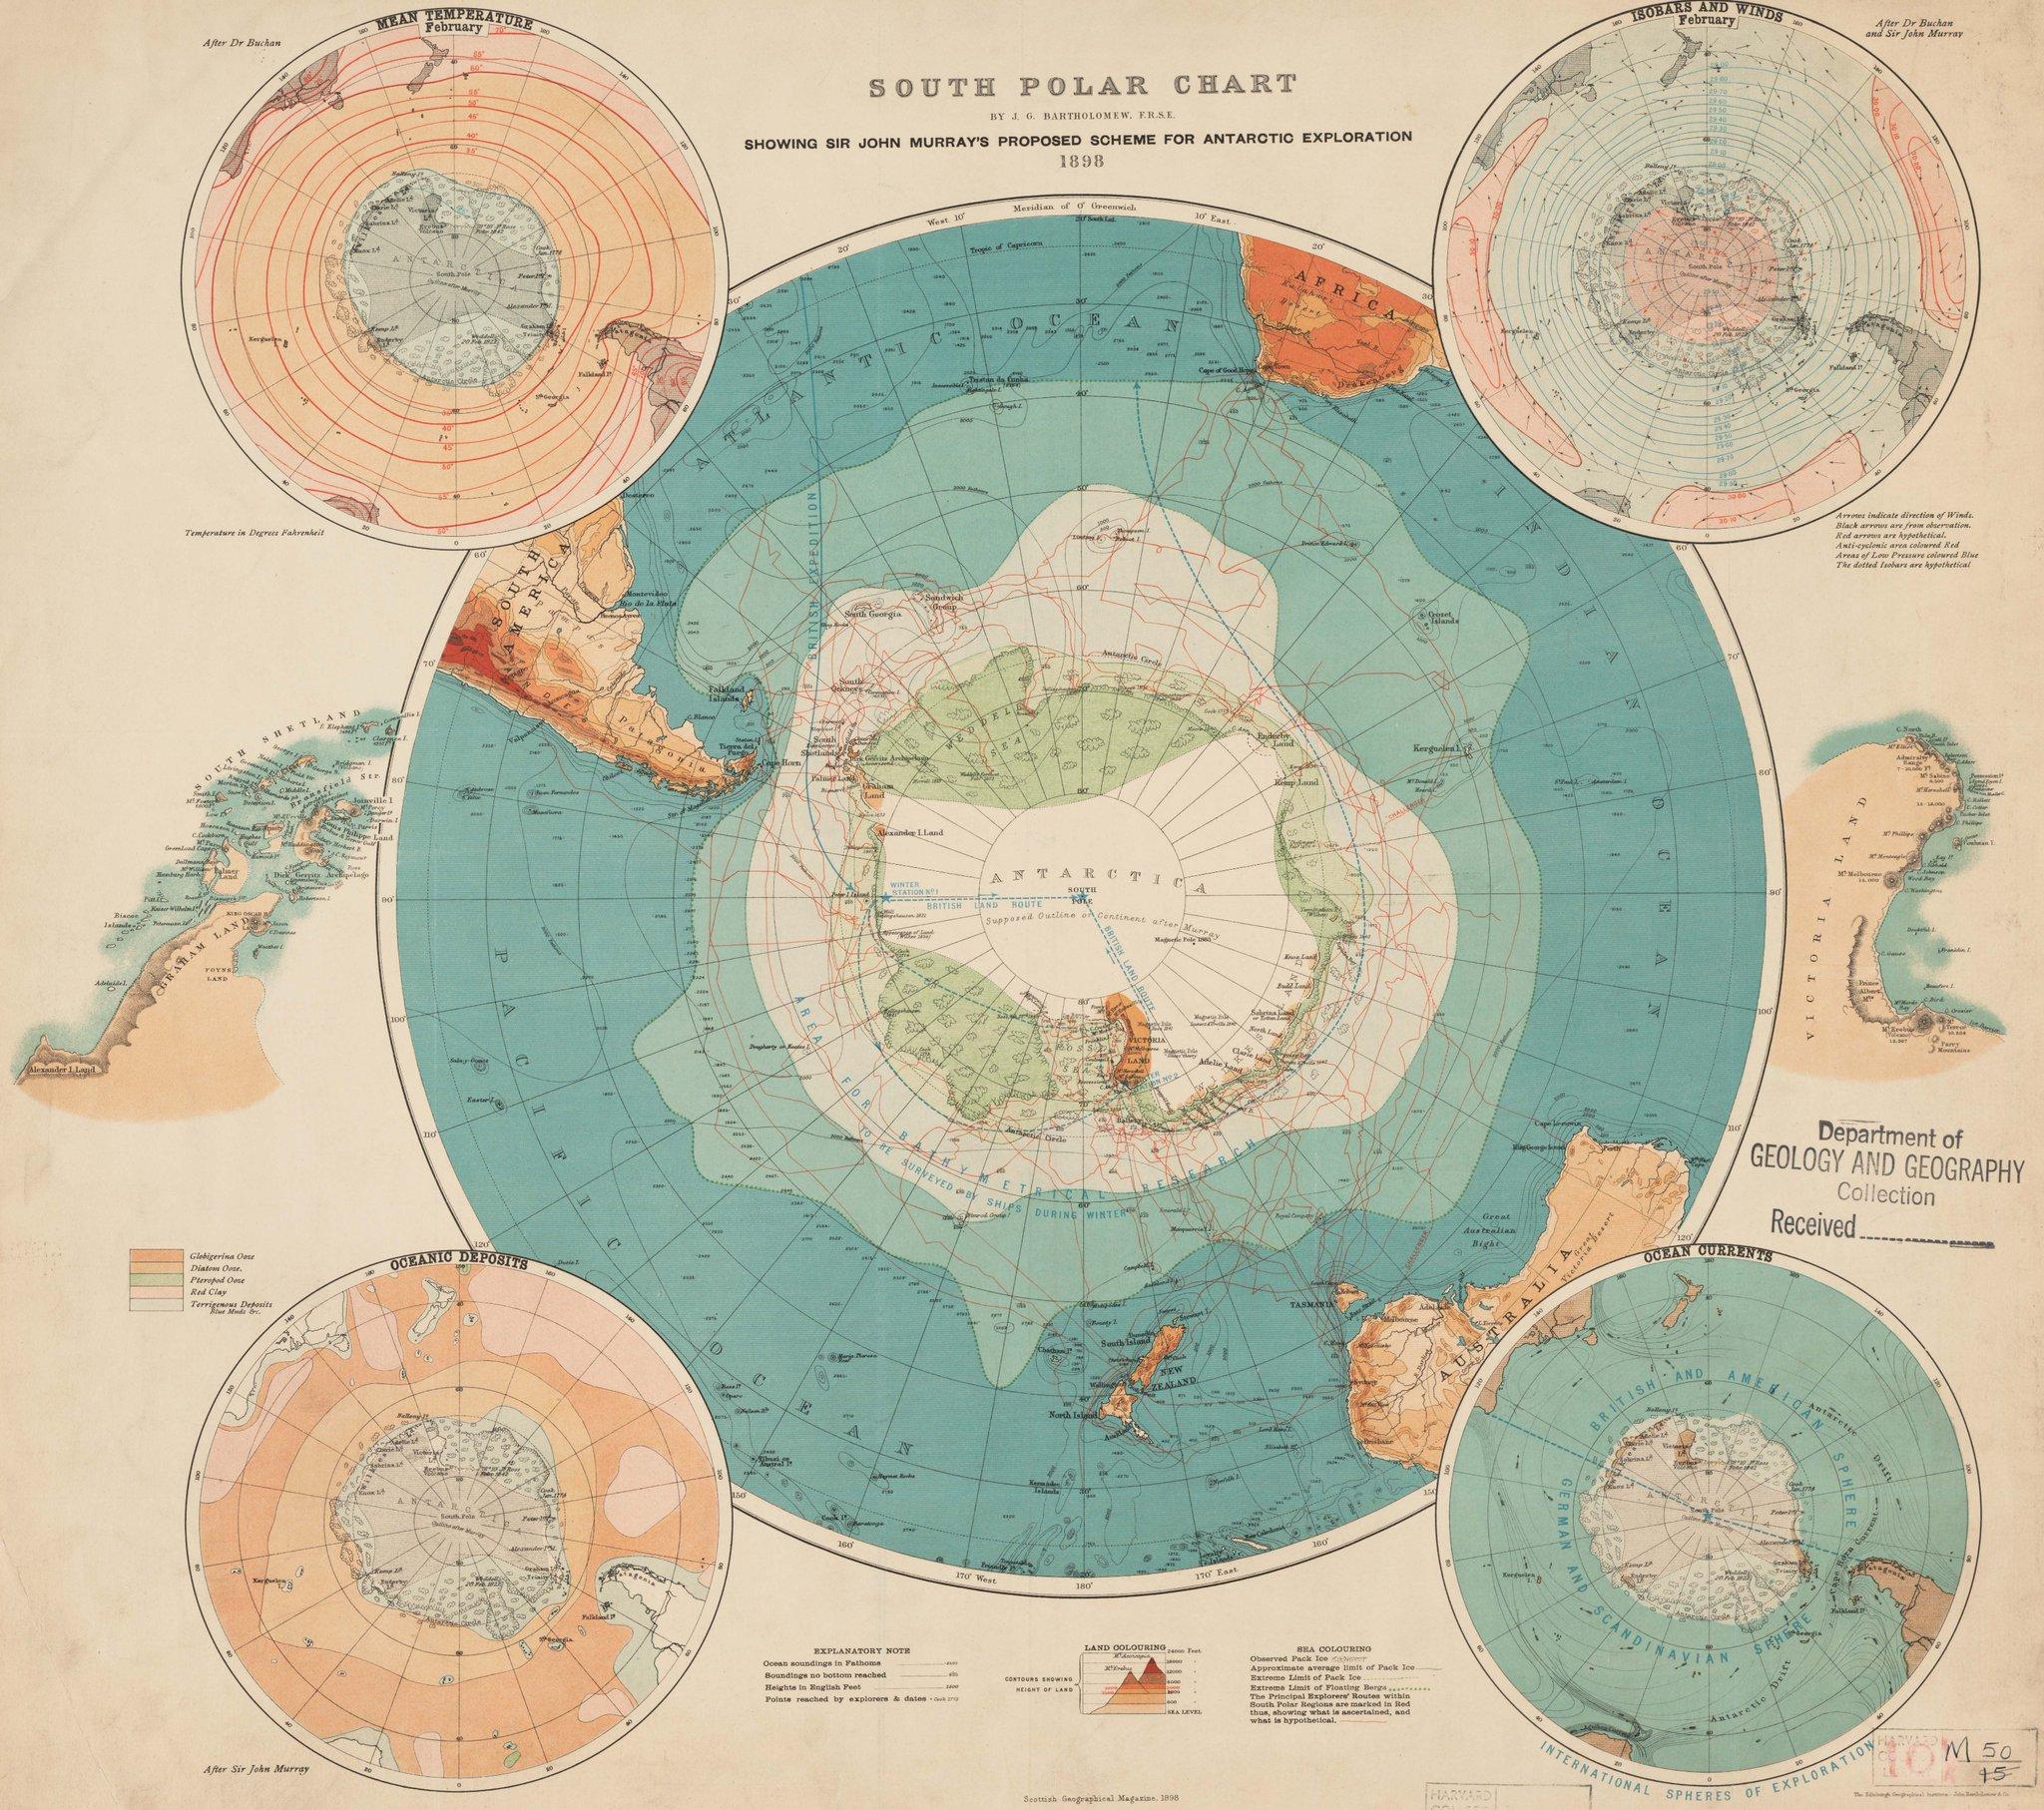 South Polar Chart